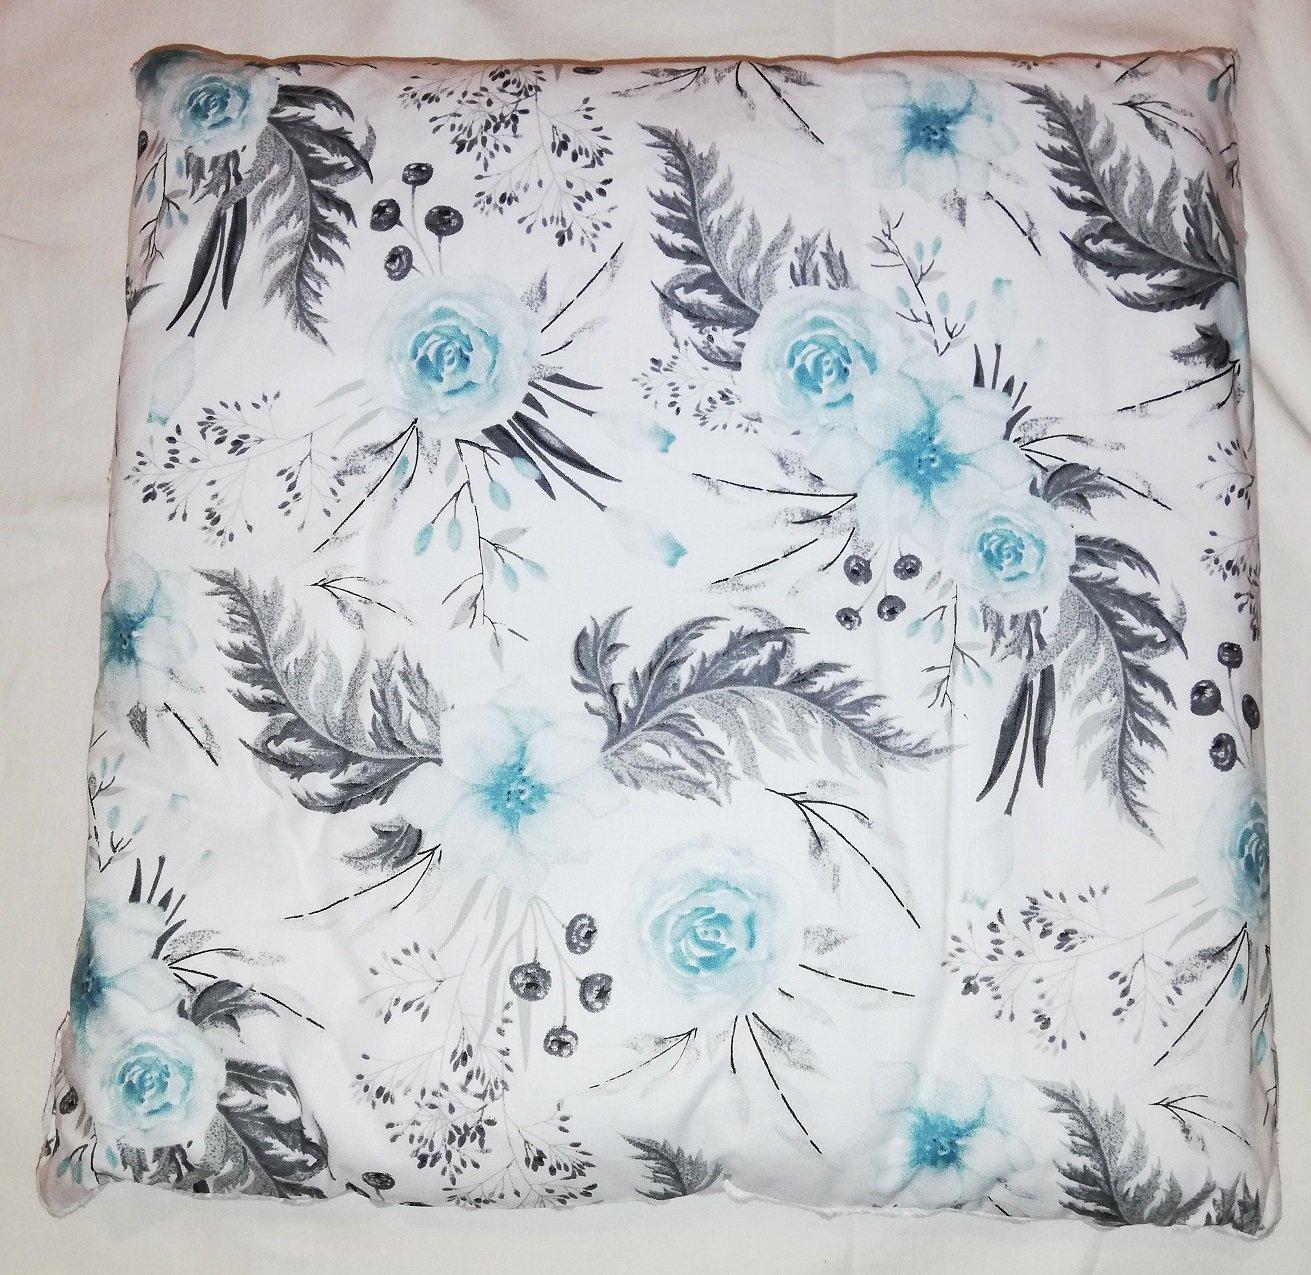 Dìtský polštáø bavlna + minky 40x40 cm kvìty zelená